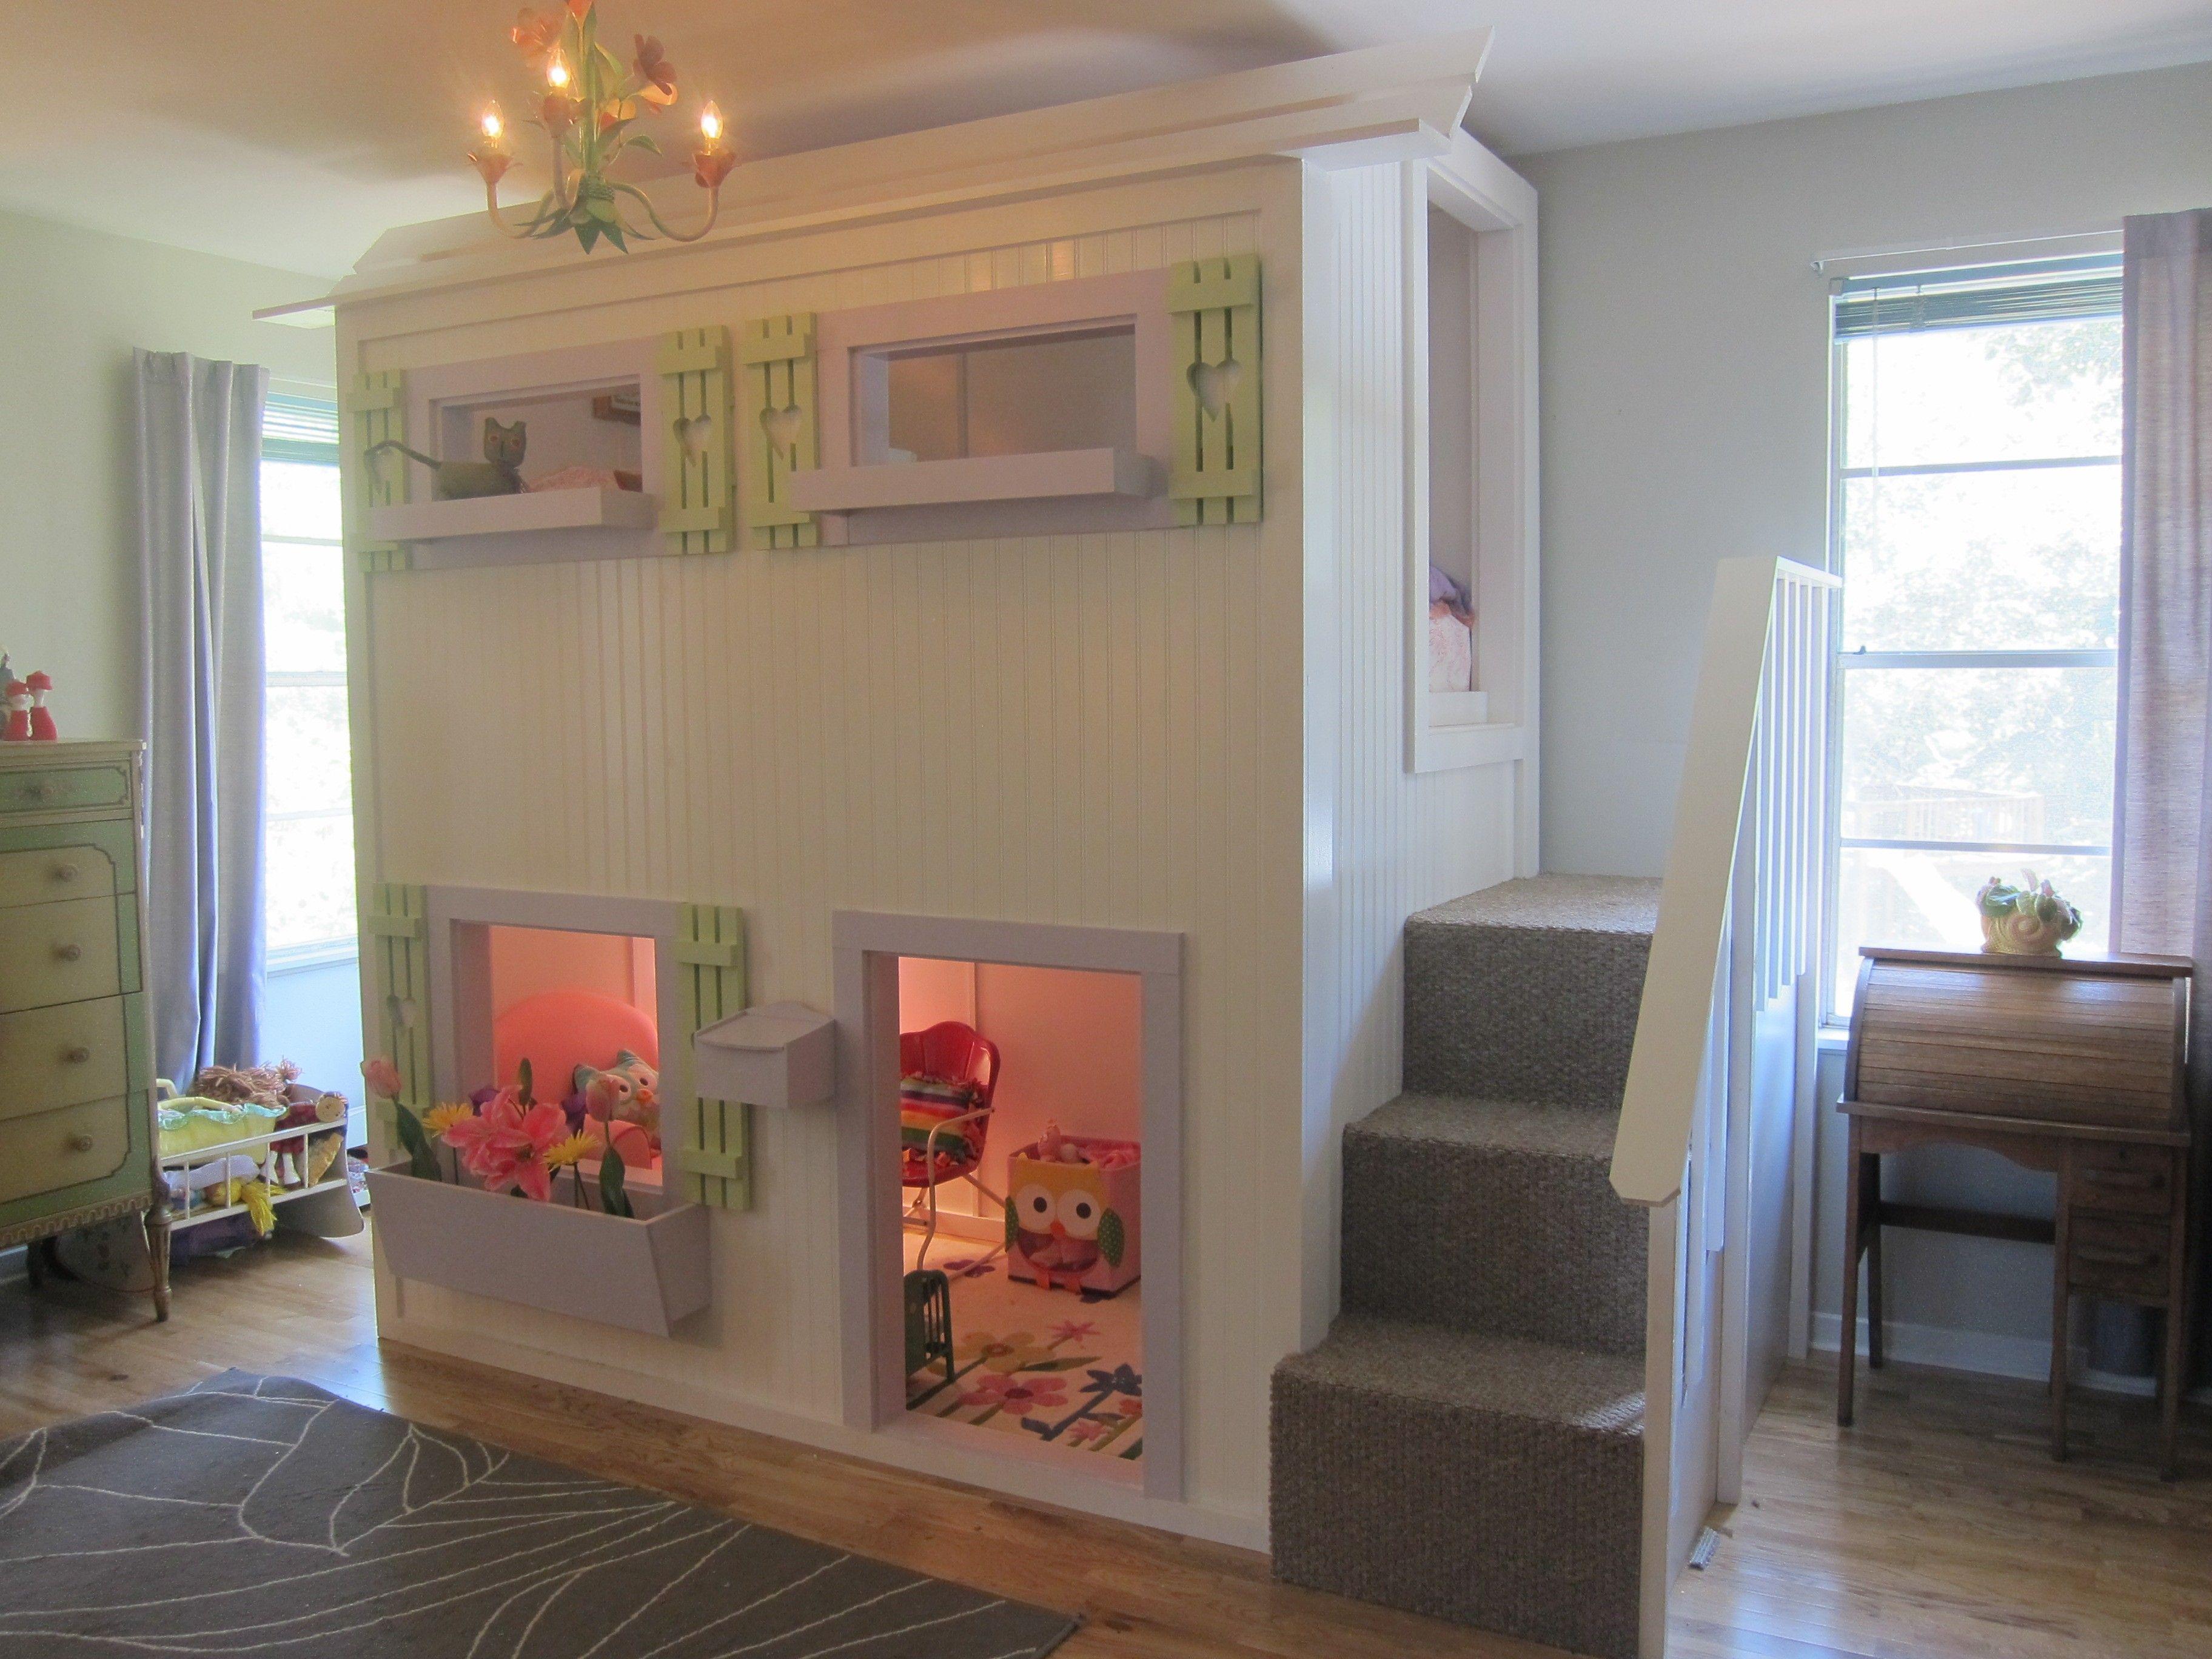 Loft bed ideas for girls  Pin by Marian GarciaCampero on PetsuBeds  Pinterest  Pet beds